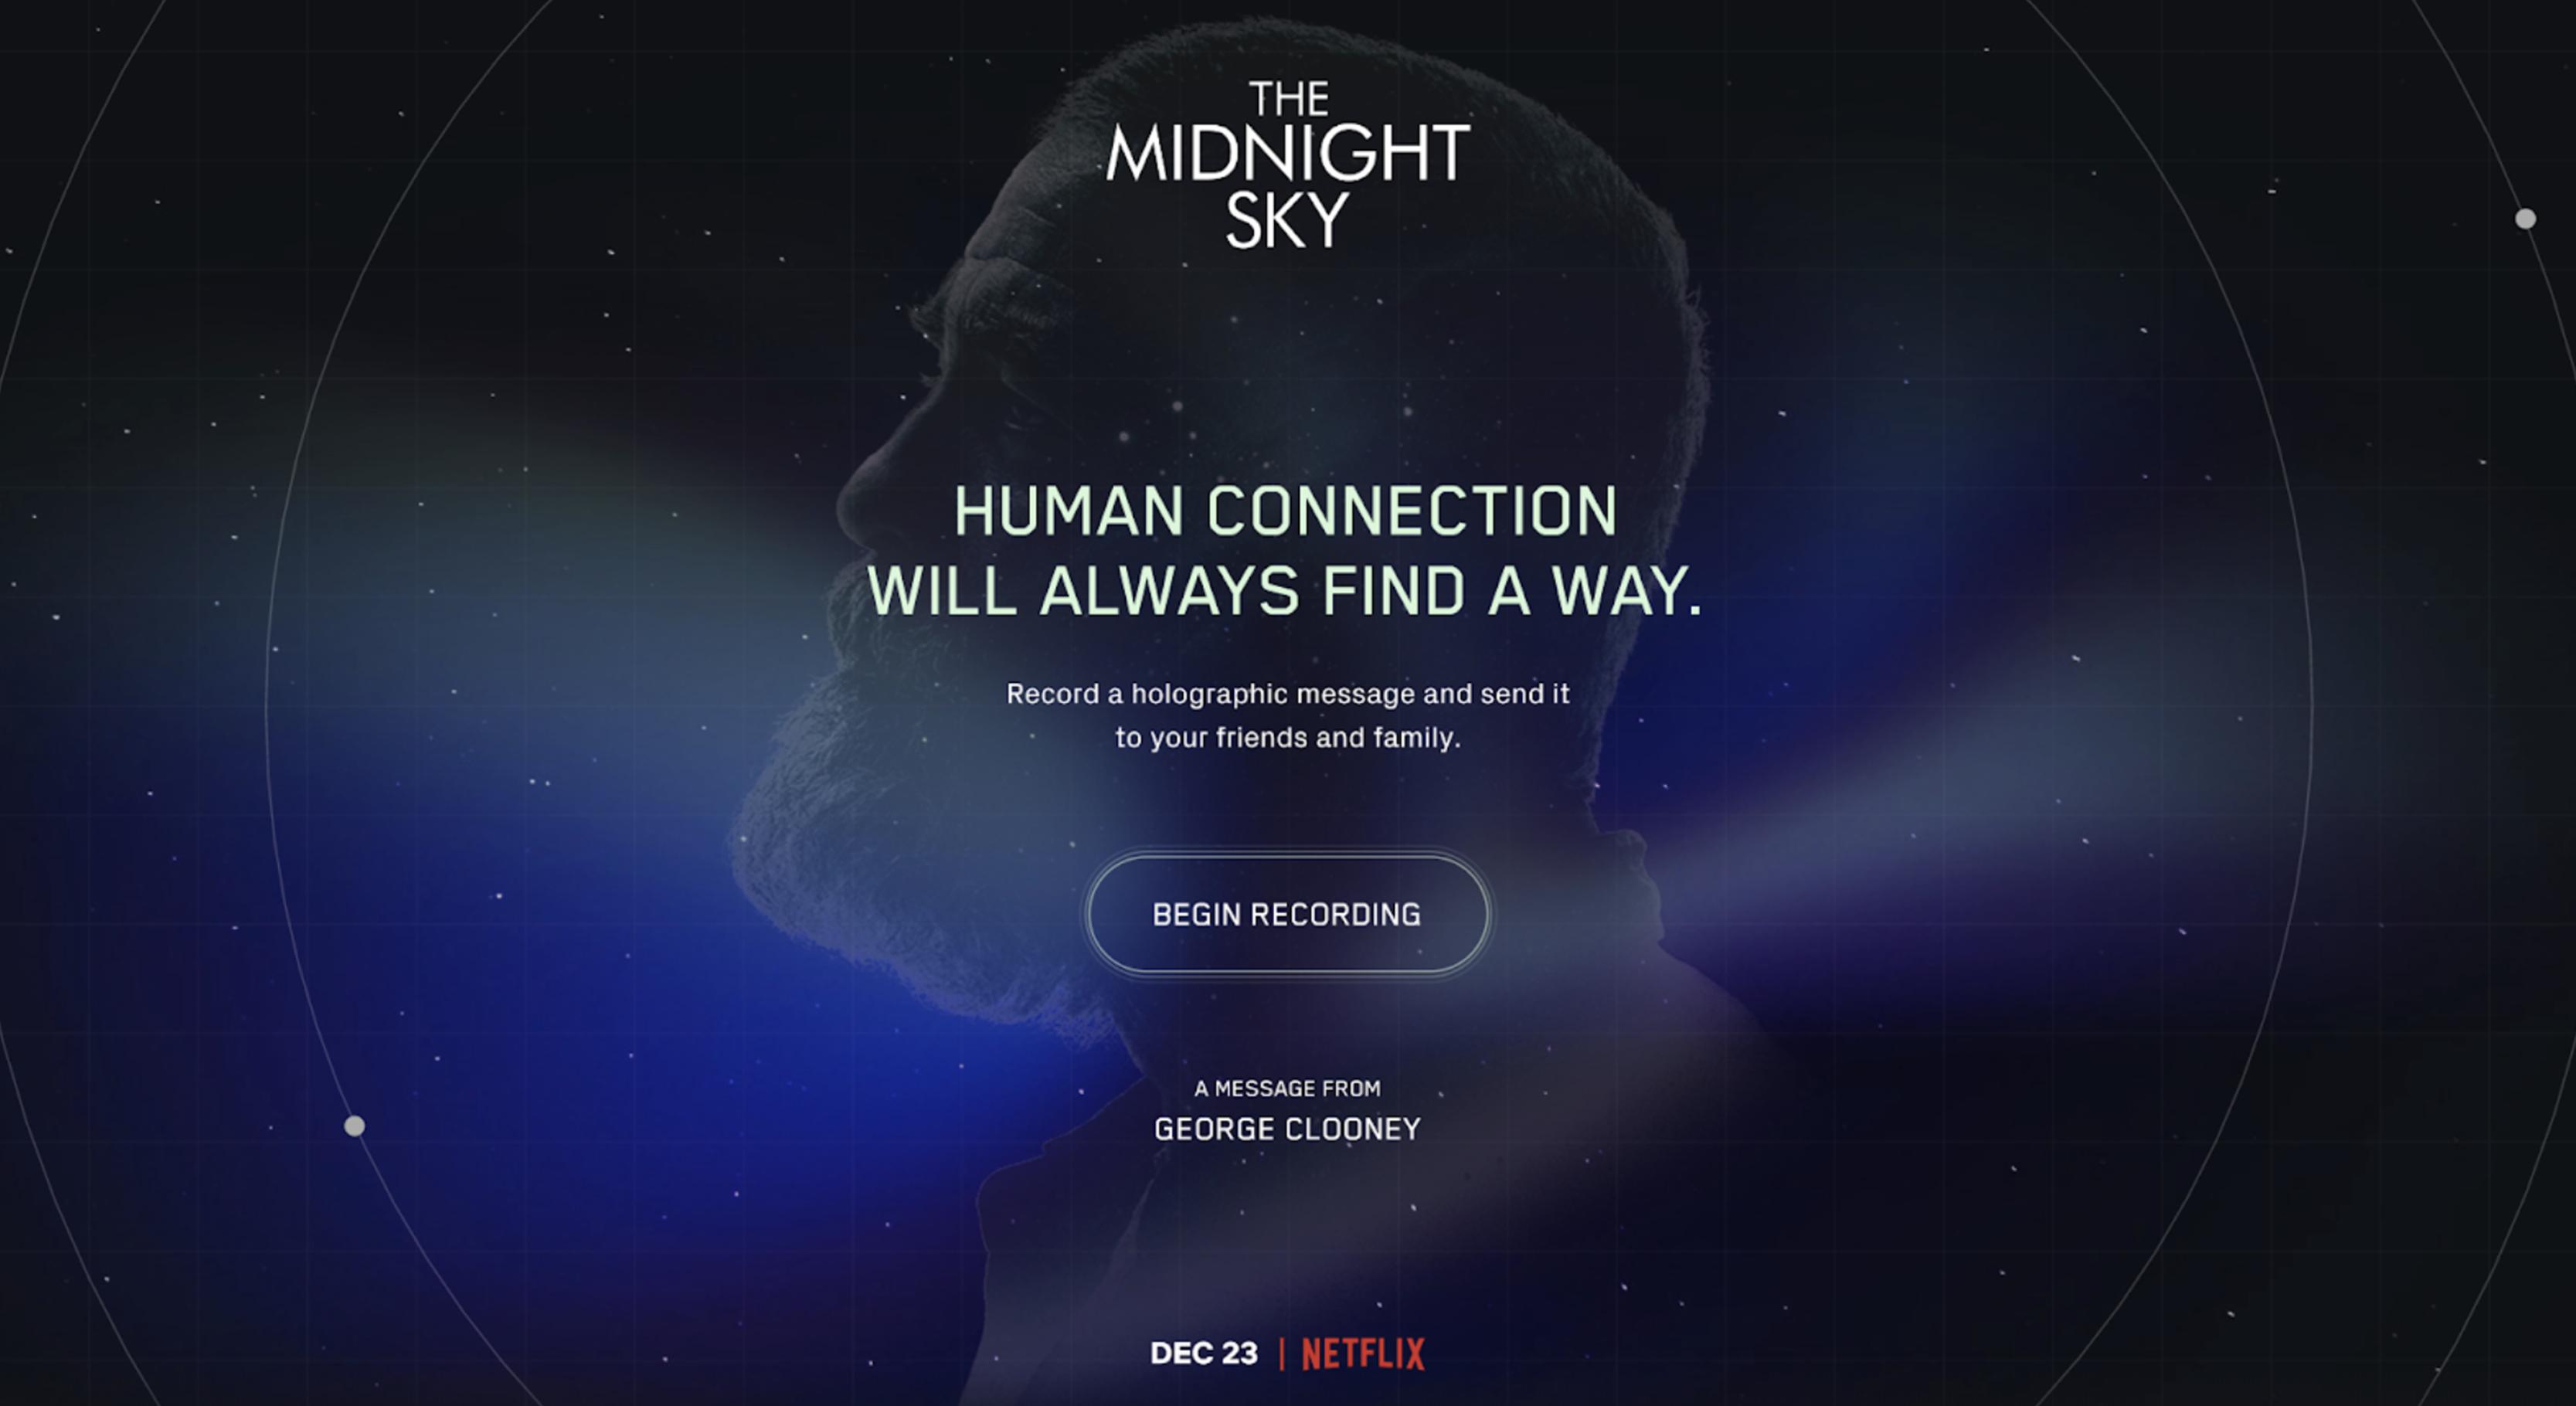 Netflix The Midnight Sky